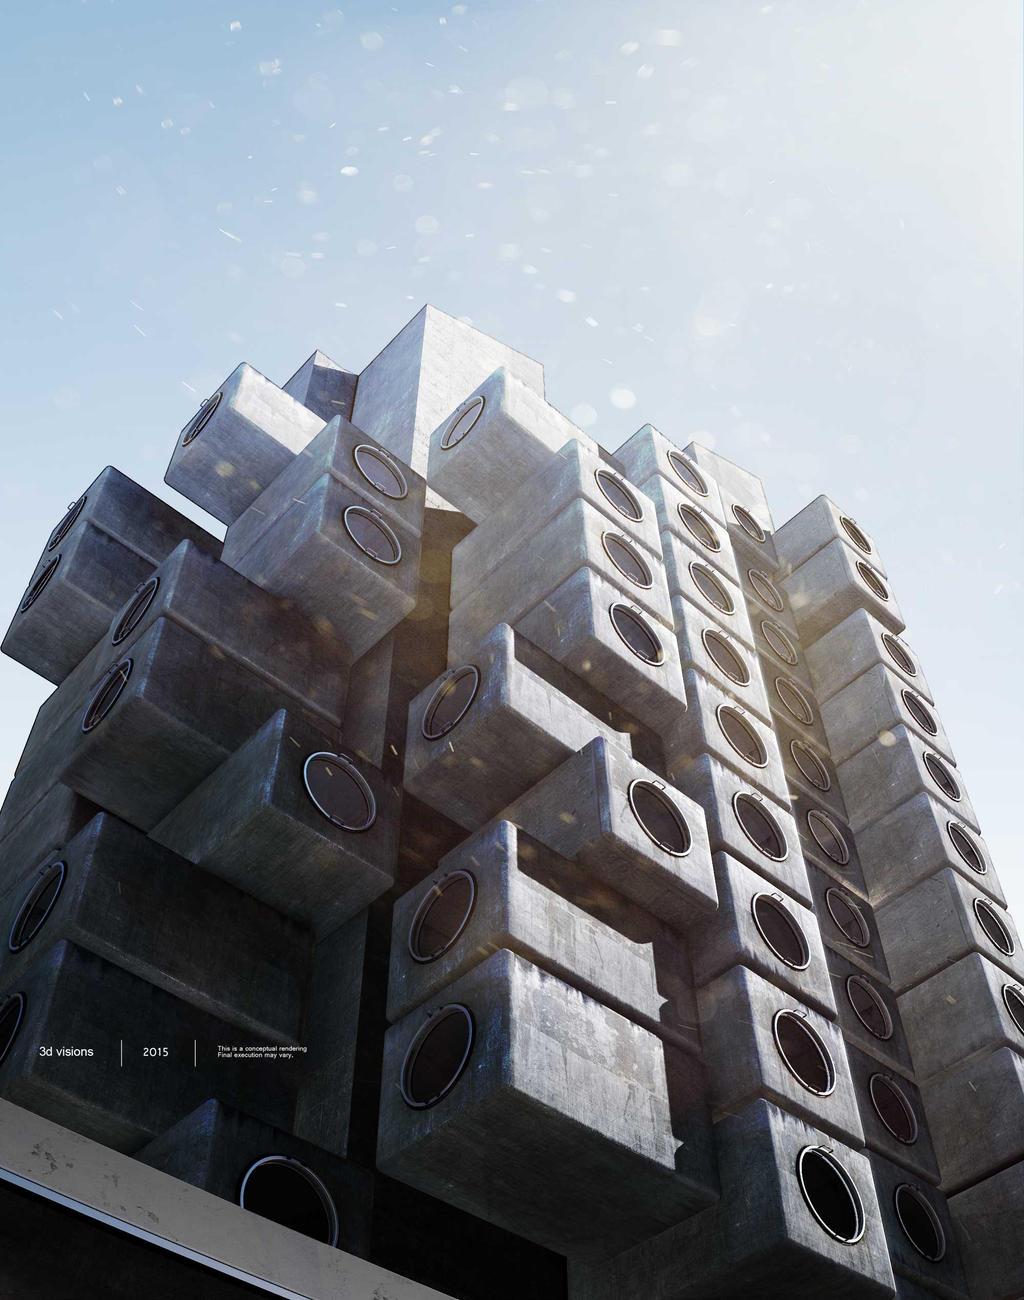 Kuro tower 2 by polperdelmar